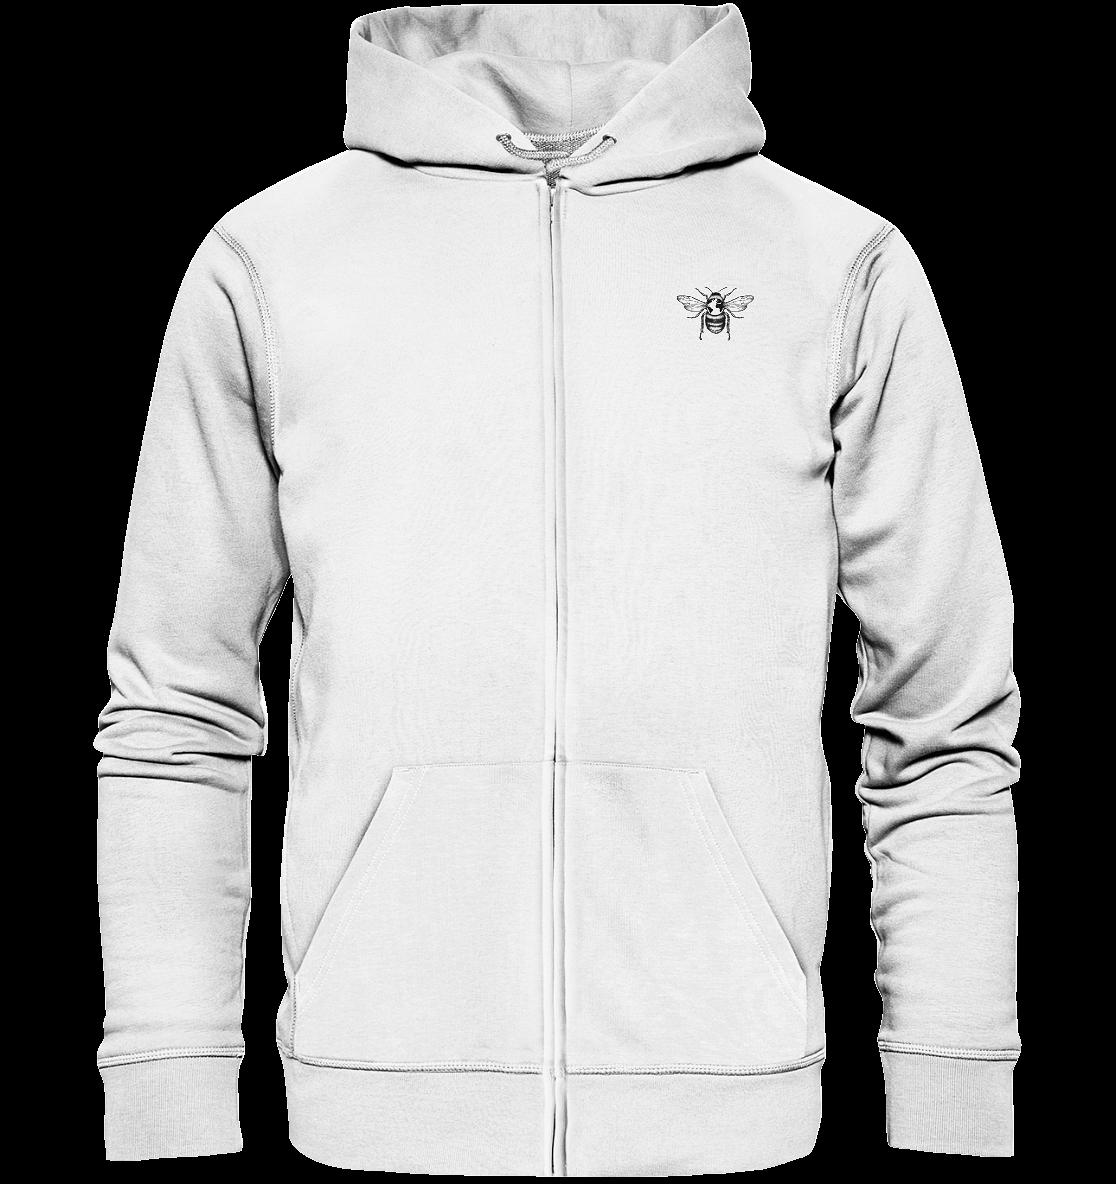 front-organic-zipper-f8f8f8-1116x.png